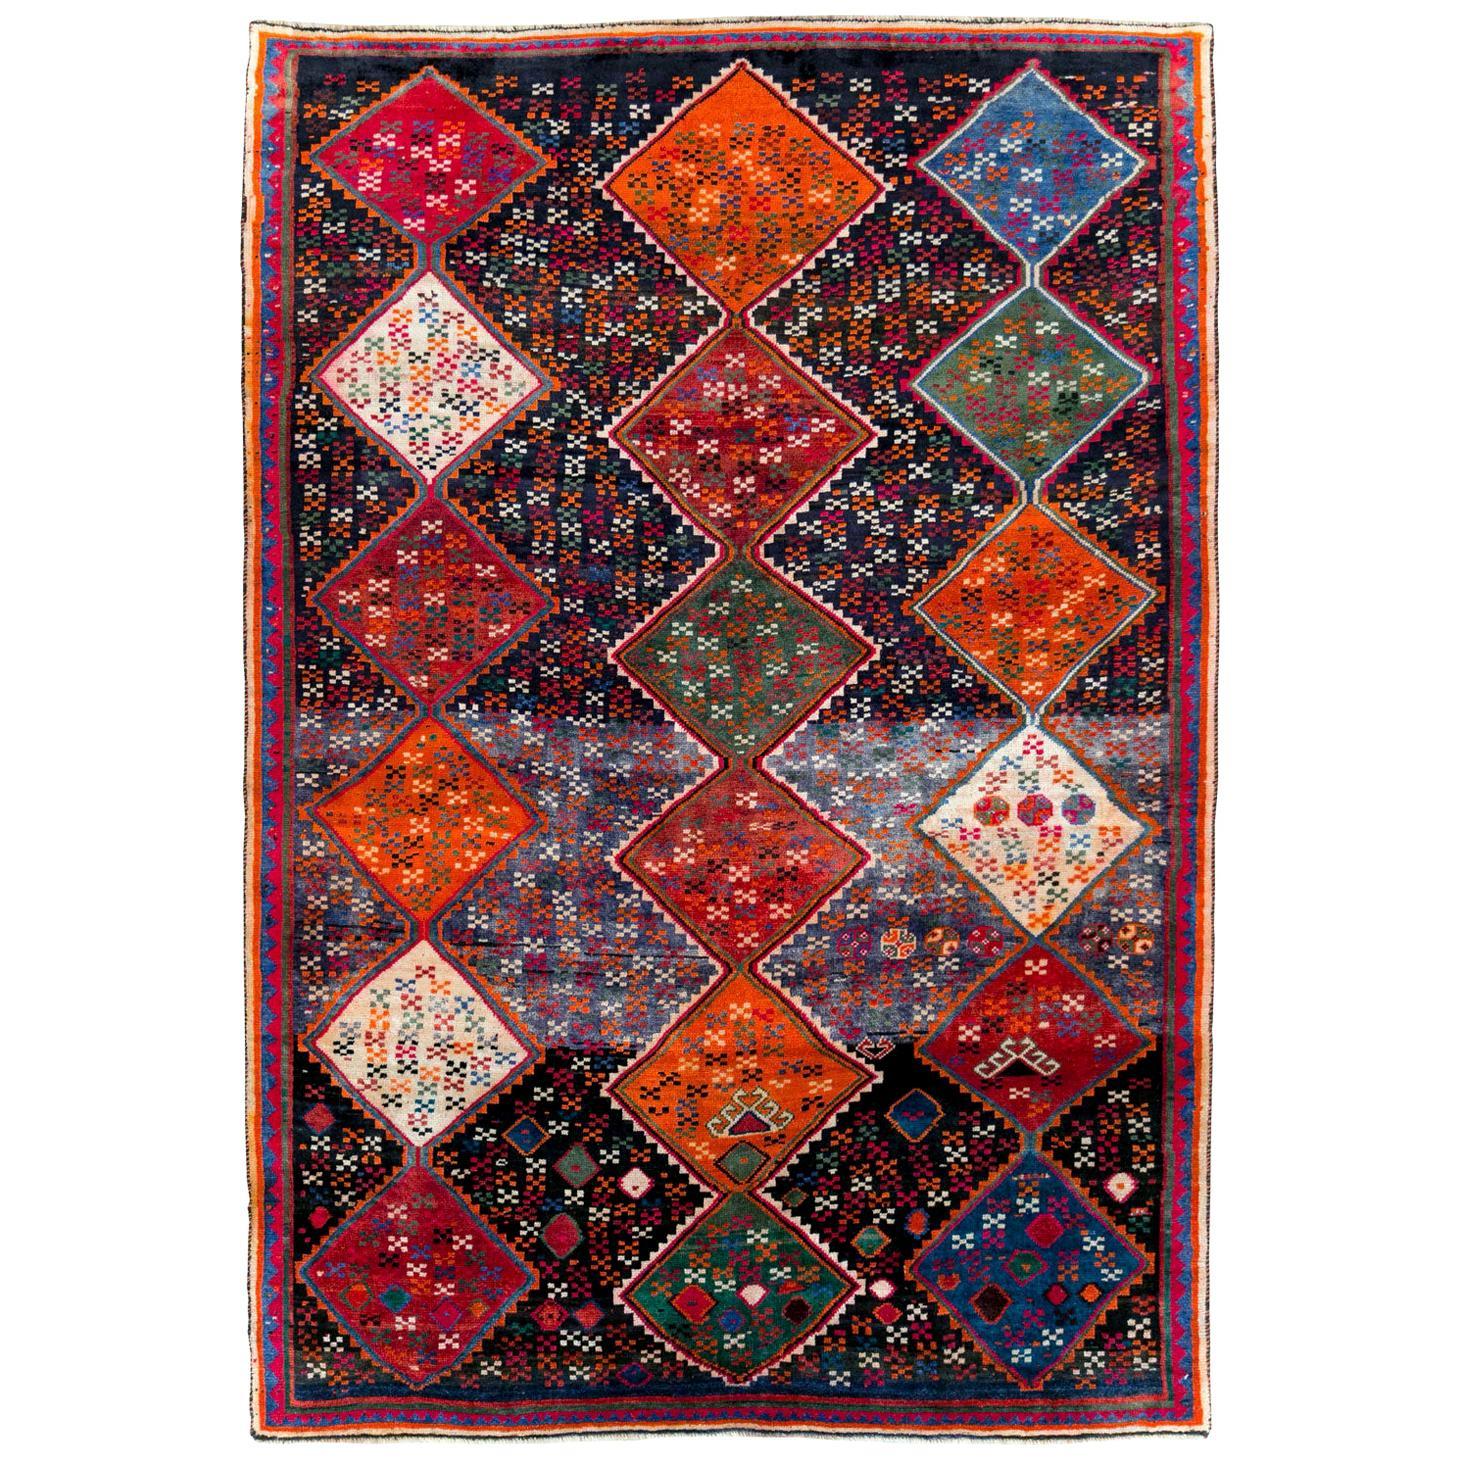 Tribal Late 20th Century Handmade Persian Shiraz Accent Rug